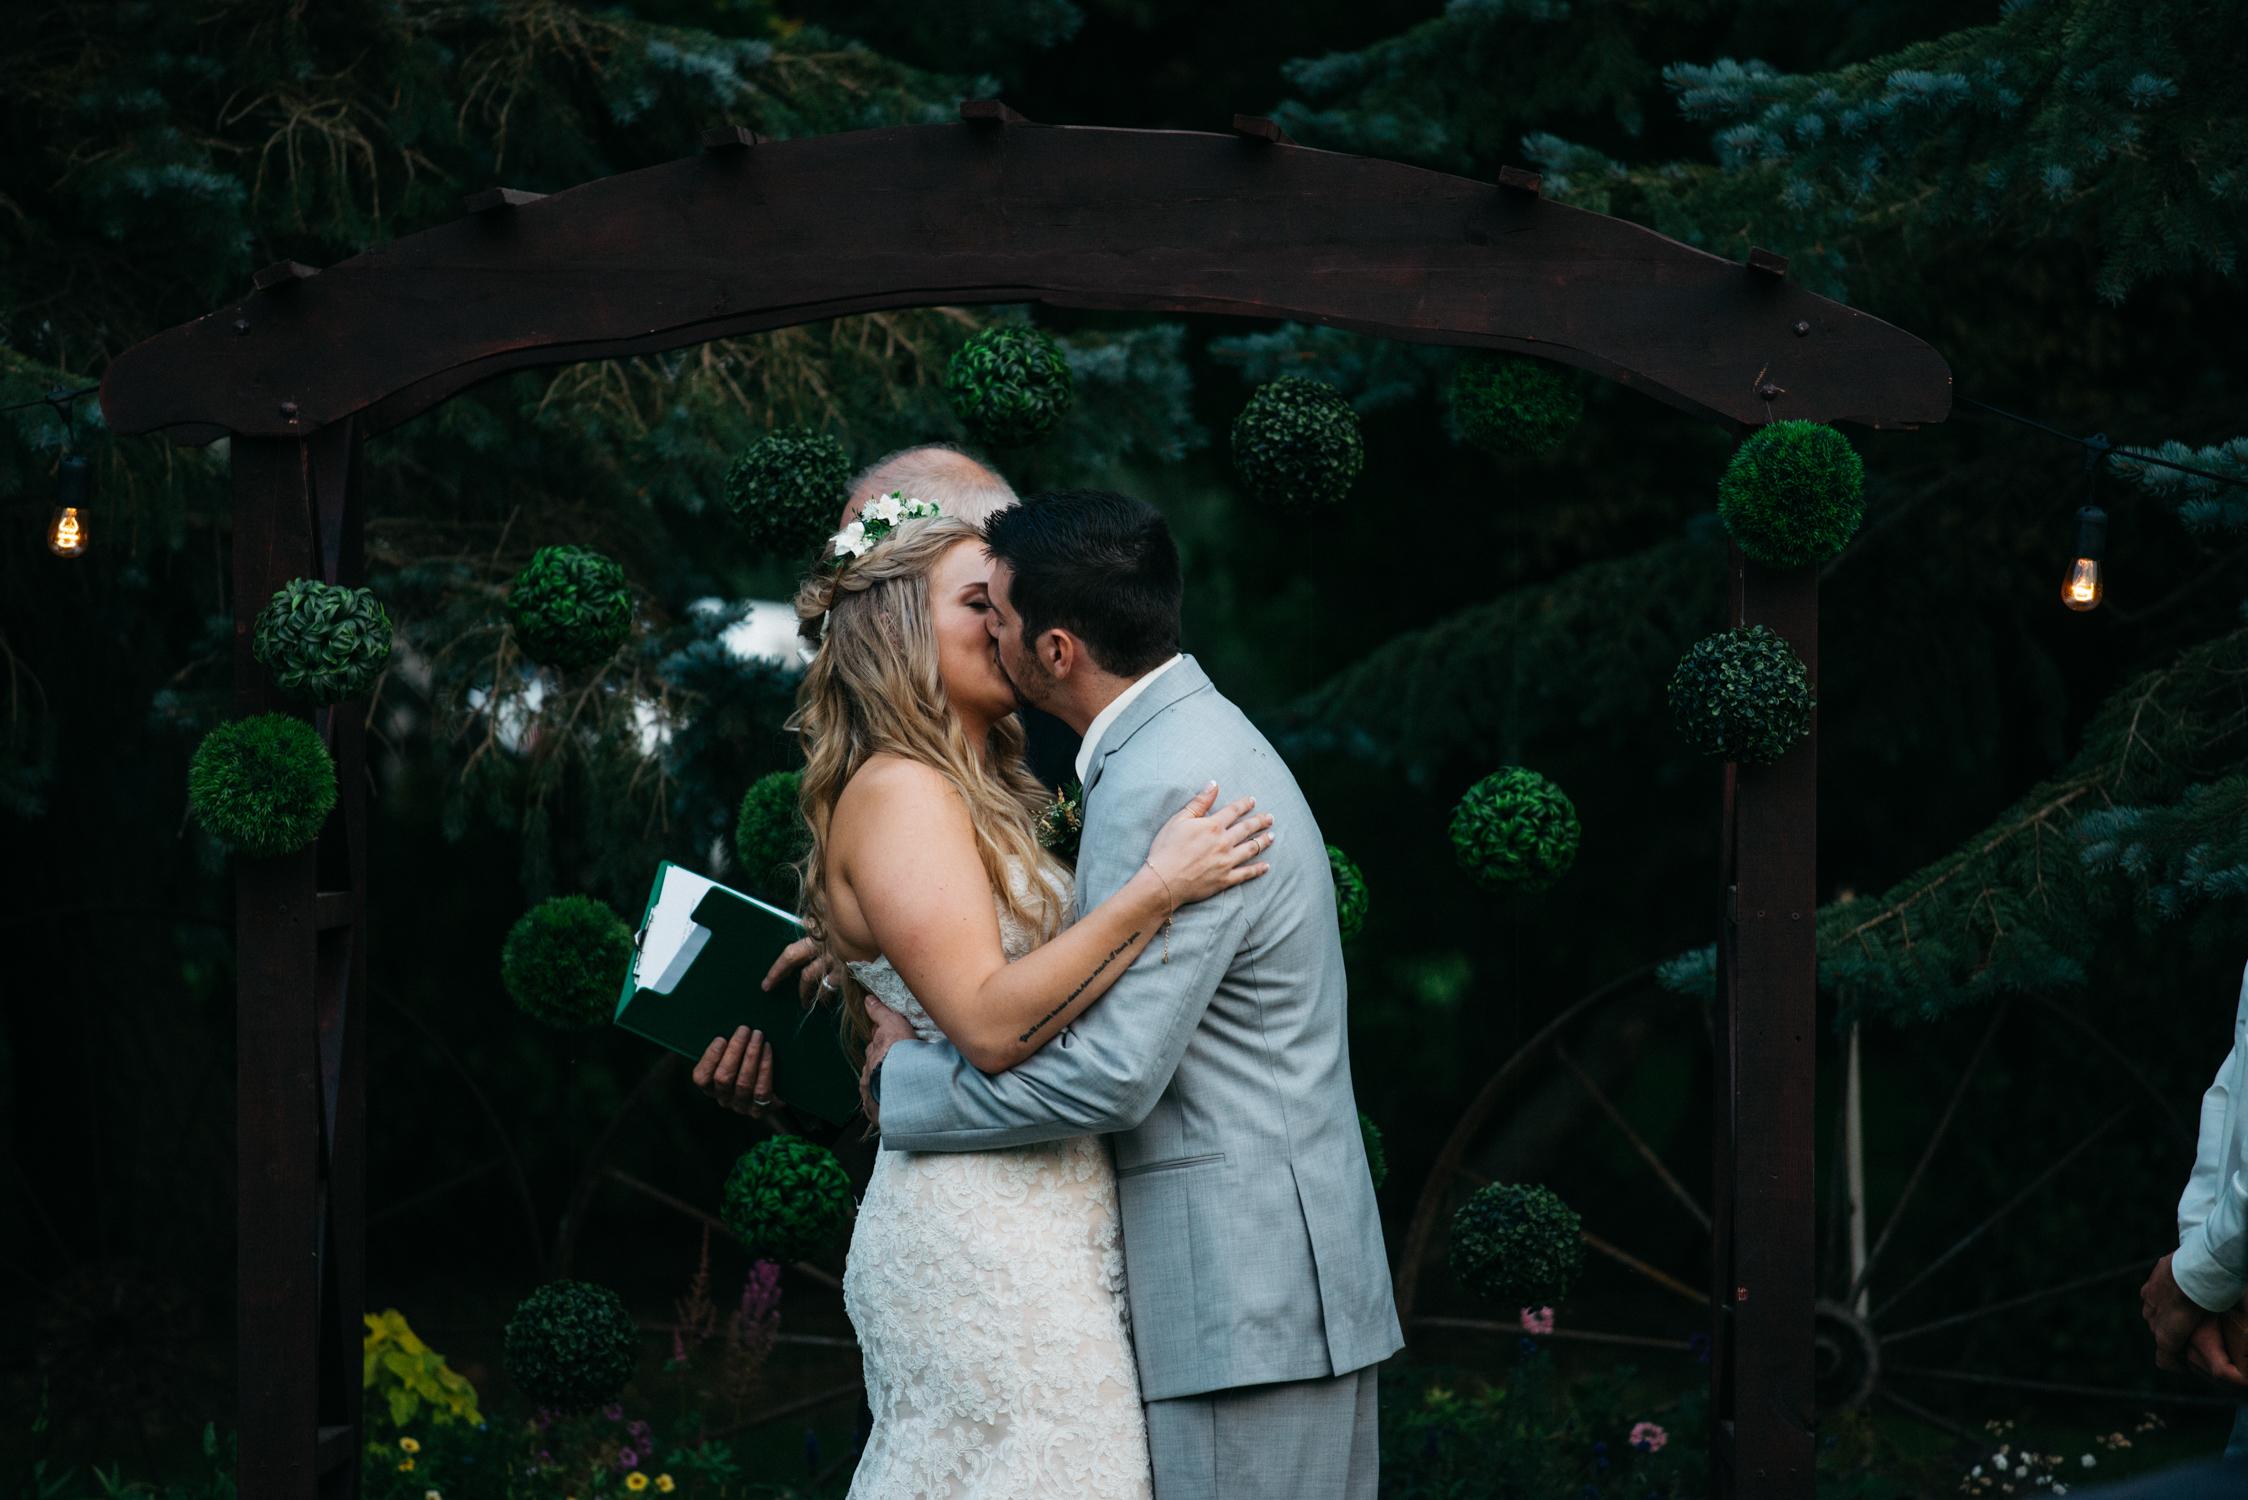 061_saskatoon_saskatchewan_small_town_wedding.jpg